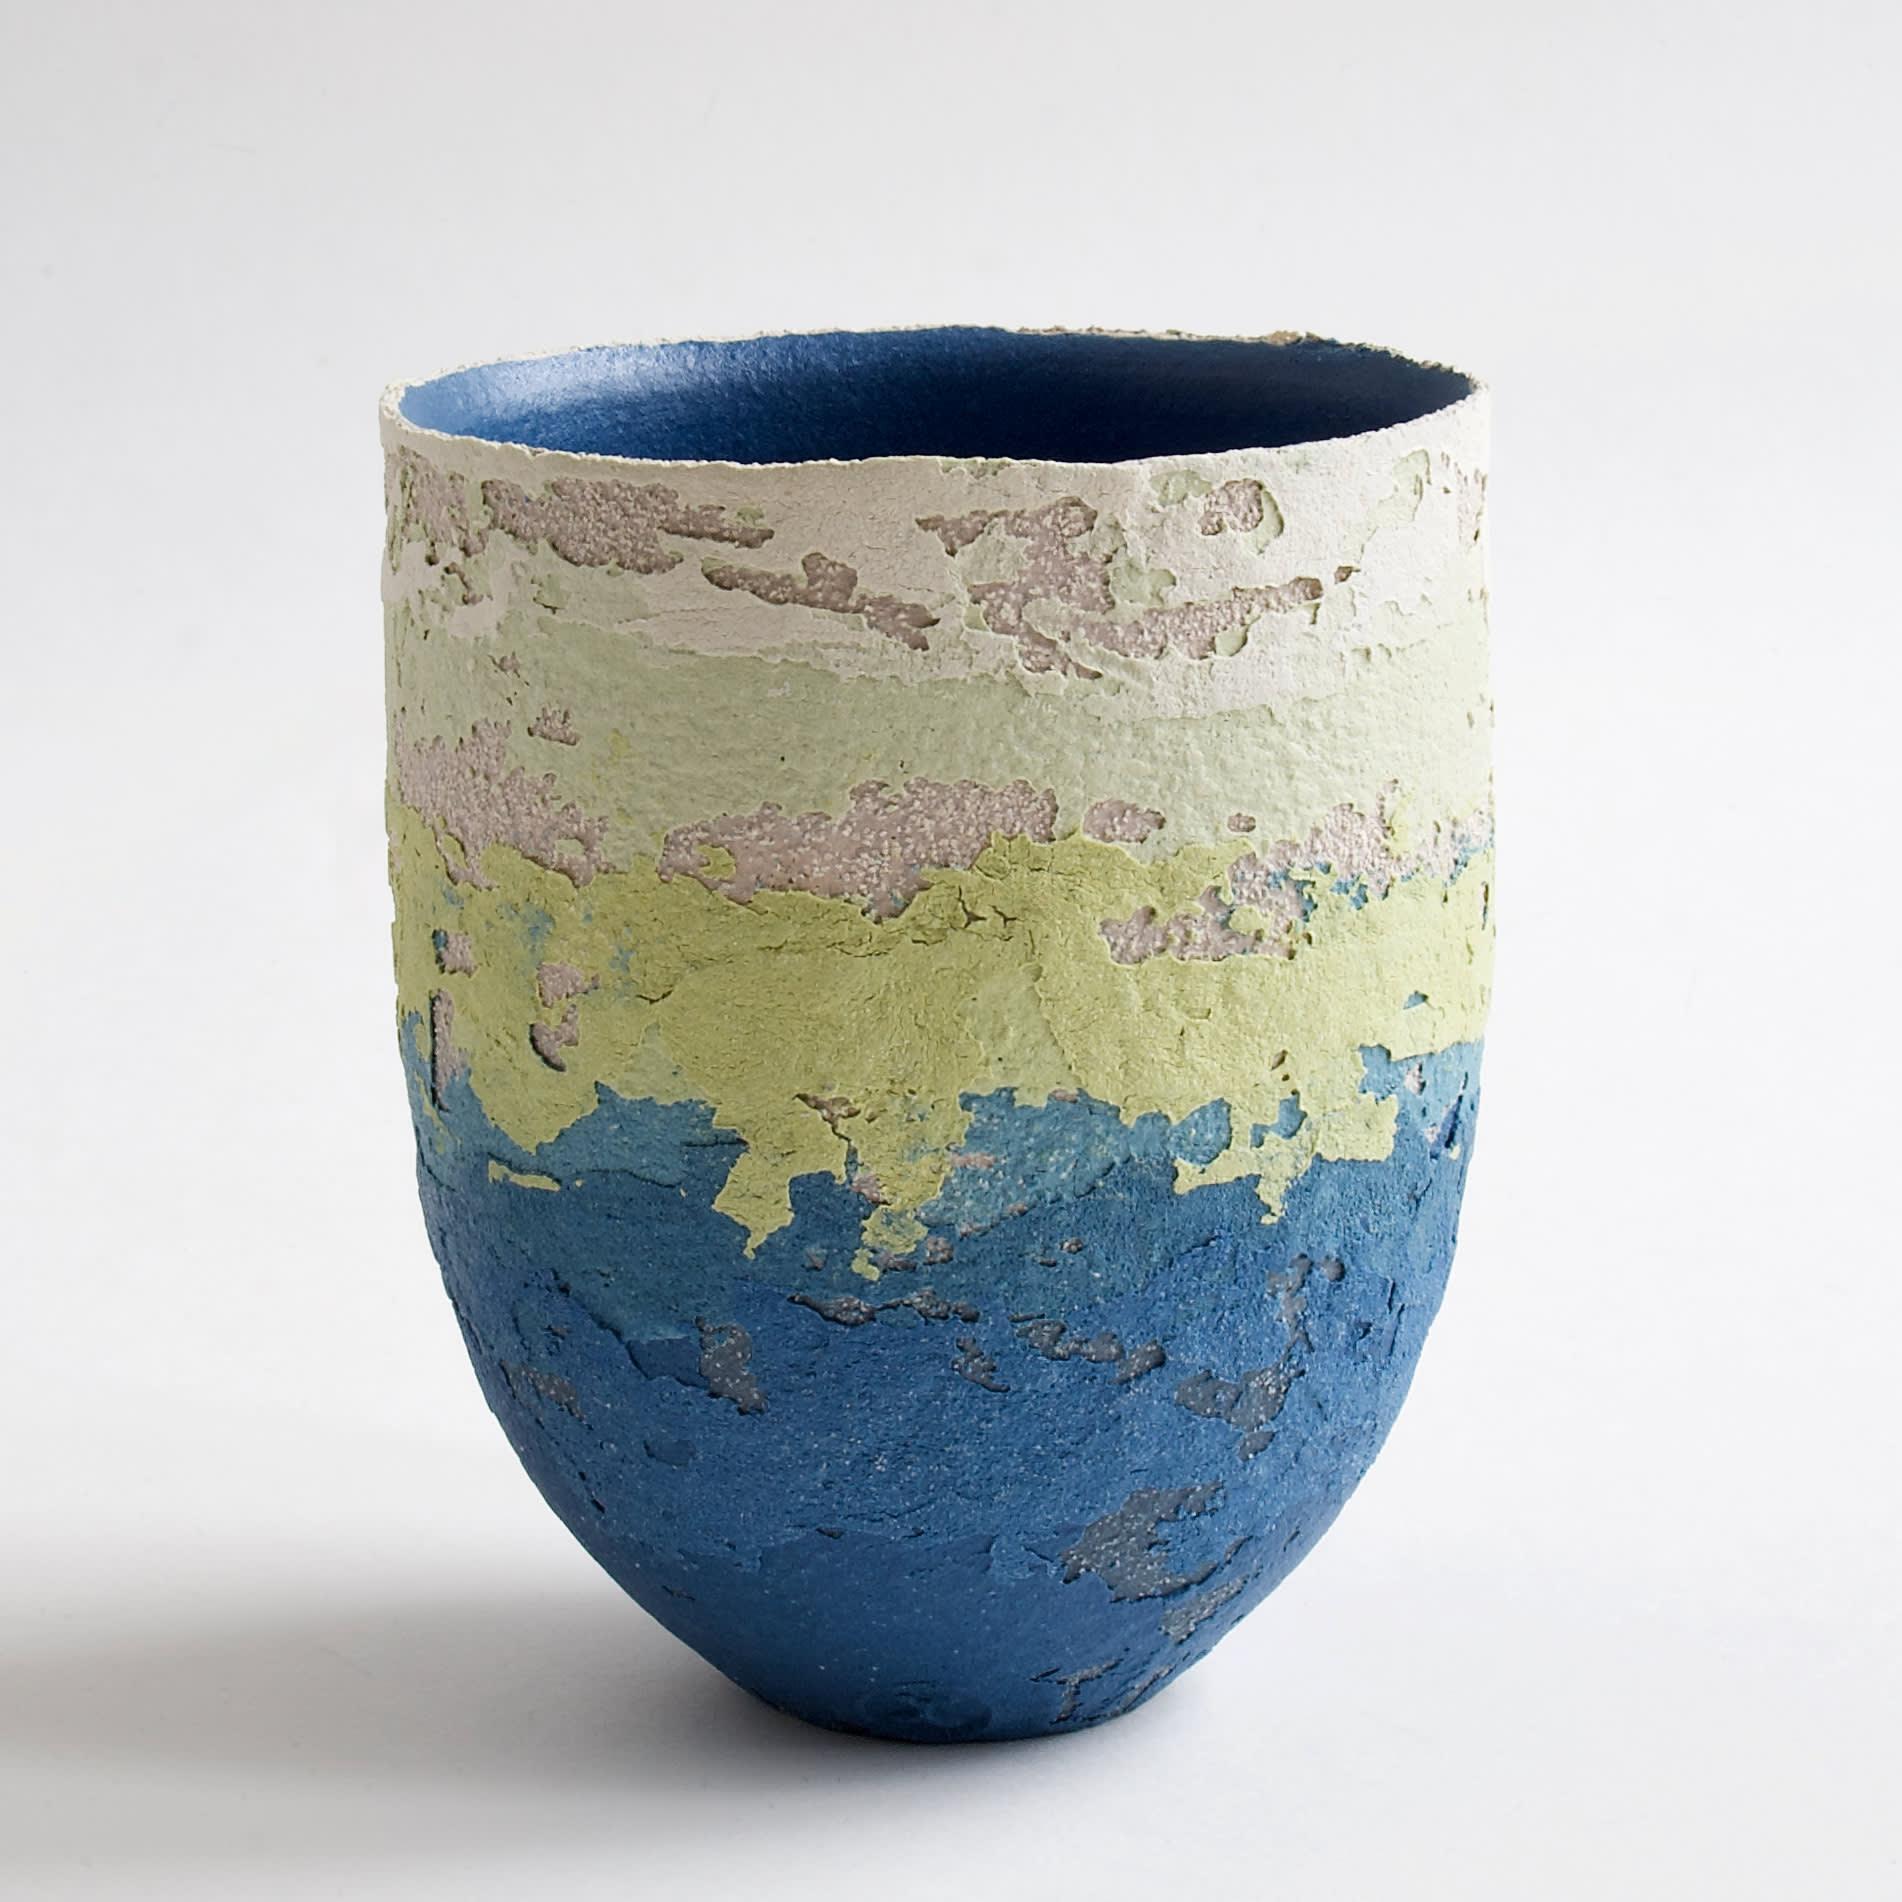 "<span class=""link fancybox-details-link""><a href=""/artists/79-clare-conrad/works/8126-clare-conrad-vessel-bright-blue-interior-2021/"">View Detail Page</a></span><div class=""artist""><strong>Clare Conrad</strong></div> b. 1948 <div class=""title""><em>Vessel, bright blue interior</em>, 2021</div> <div class=""medium"">wheel-thrown stoneware </div> <div class=""dimensions"">h. 12 cm </div><div class=""price"">£132.00</div><div class=""copyright_line"">Own Art: £13.20 x 10 Months, 0% APR</div>"